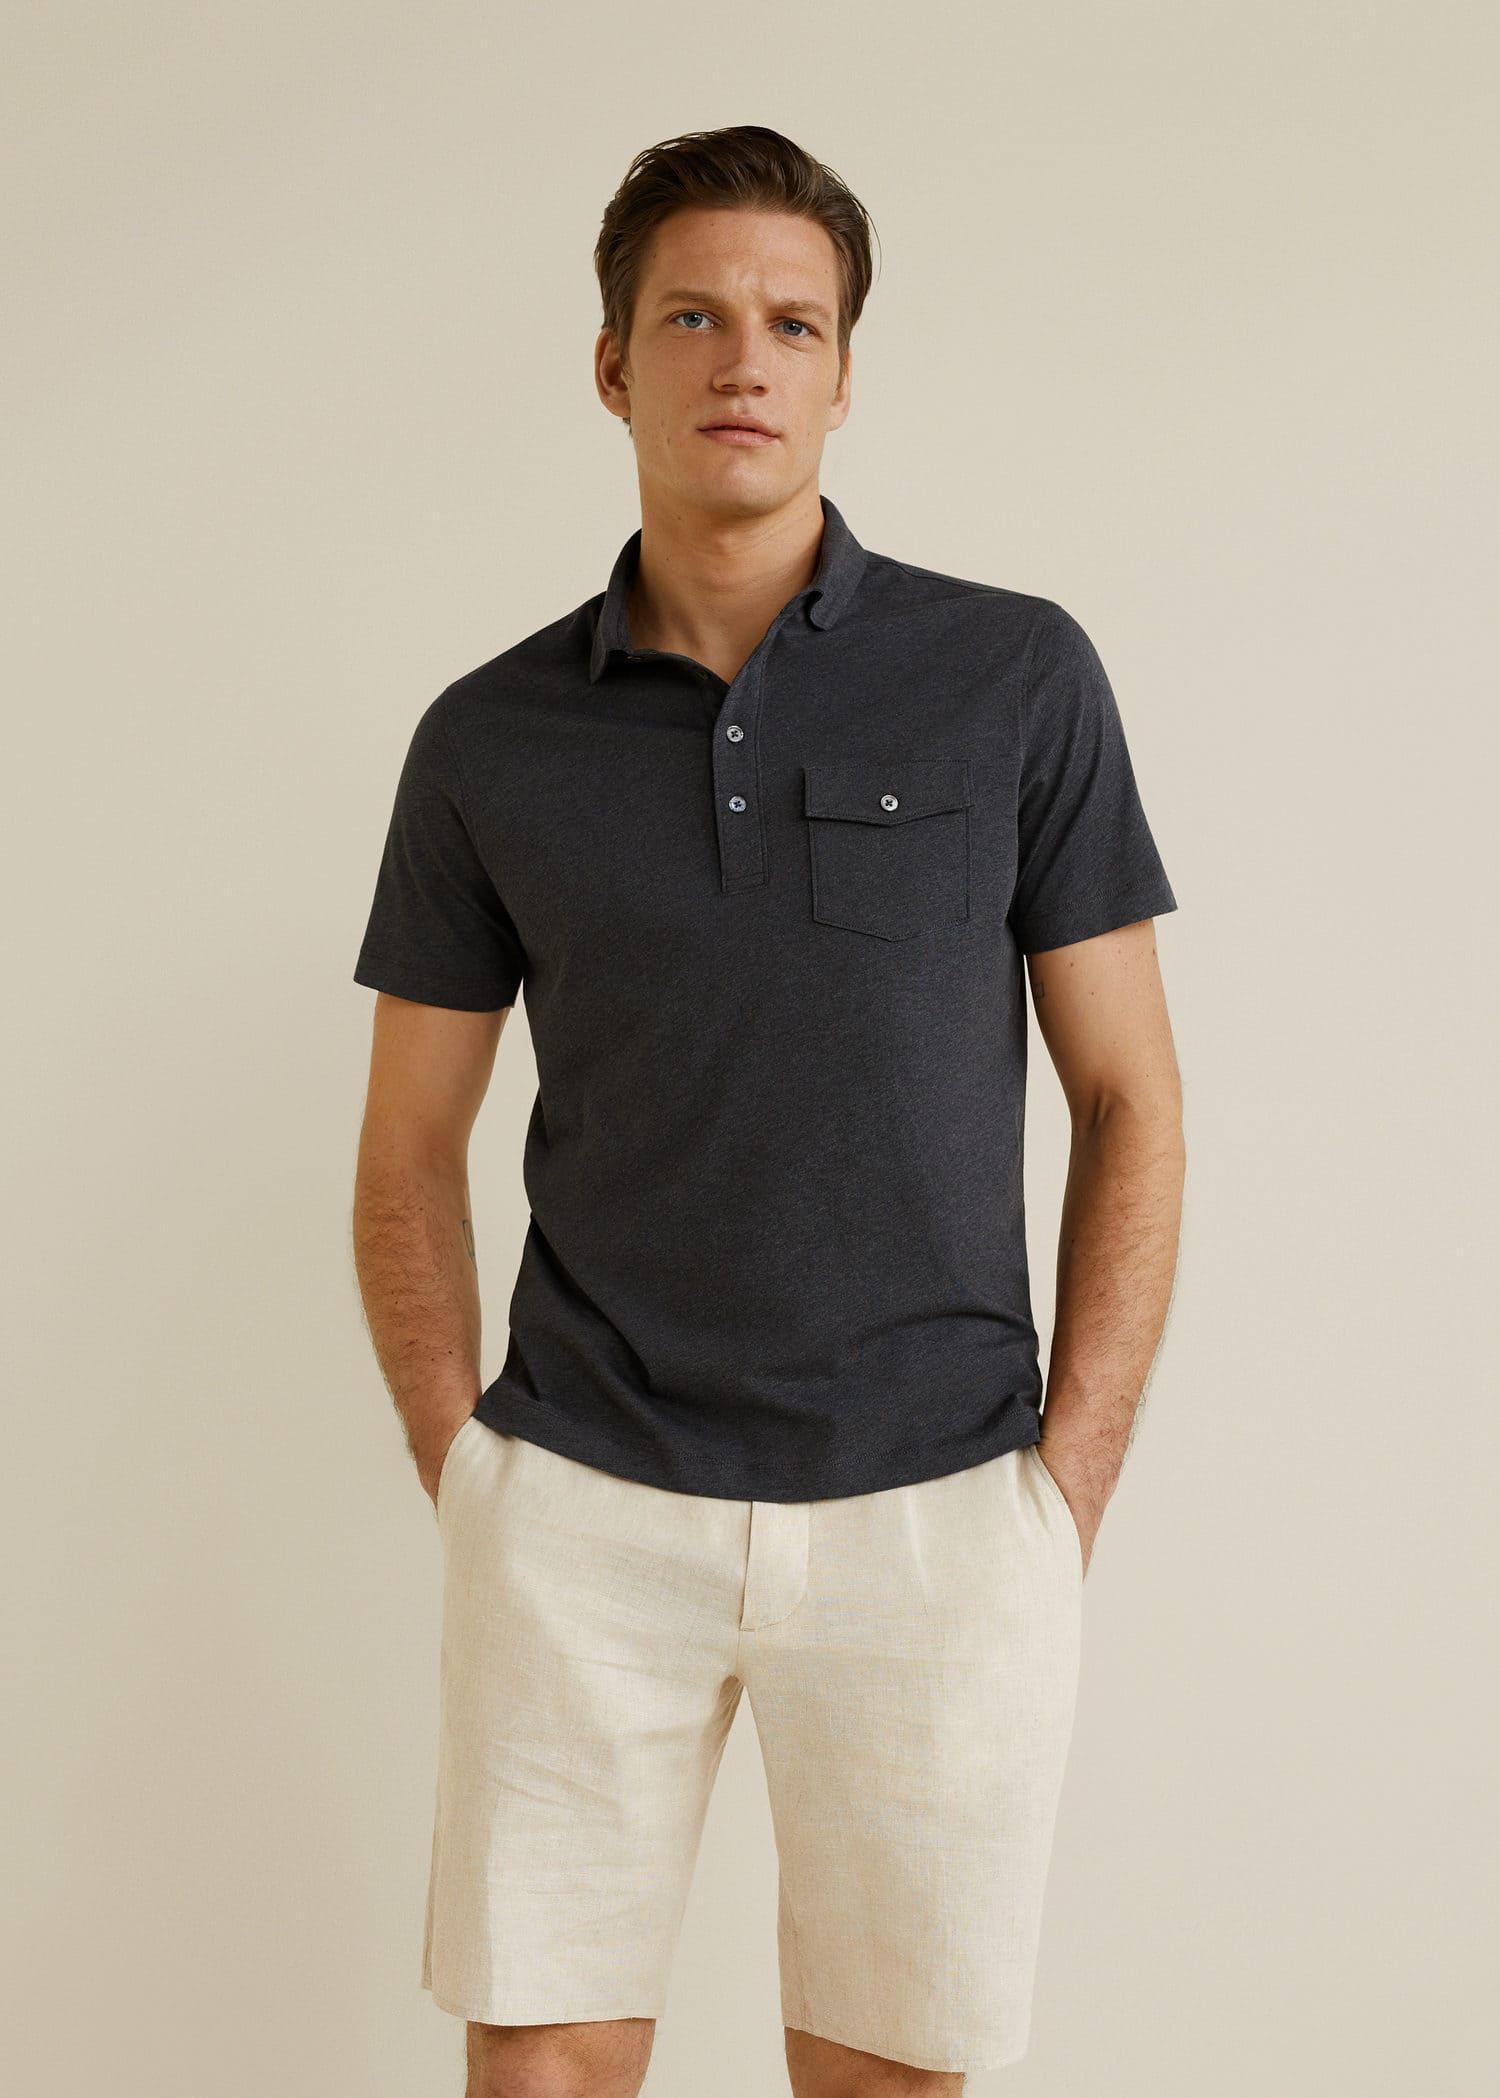 cotton shirt apply pol - HD900×1200